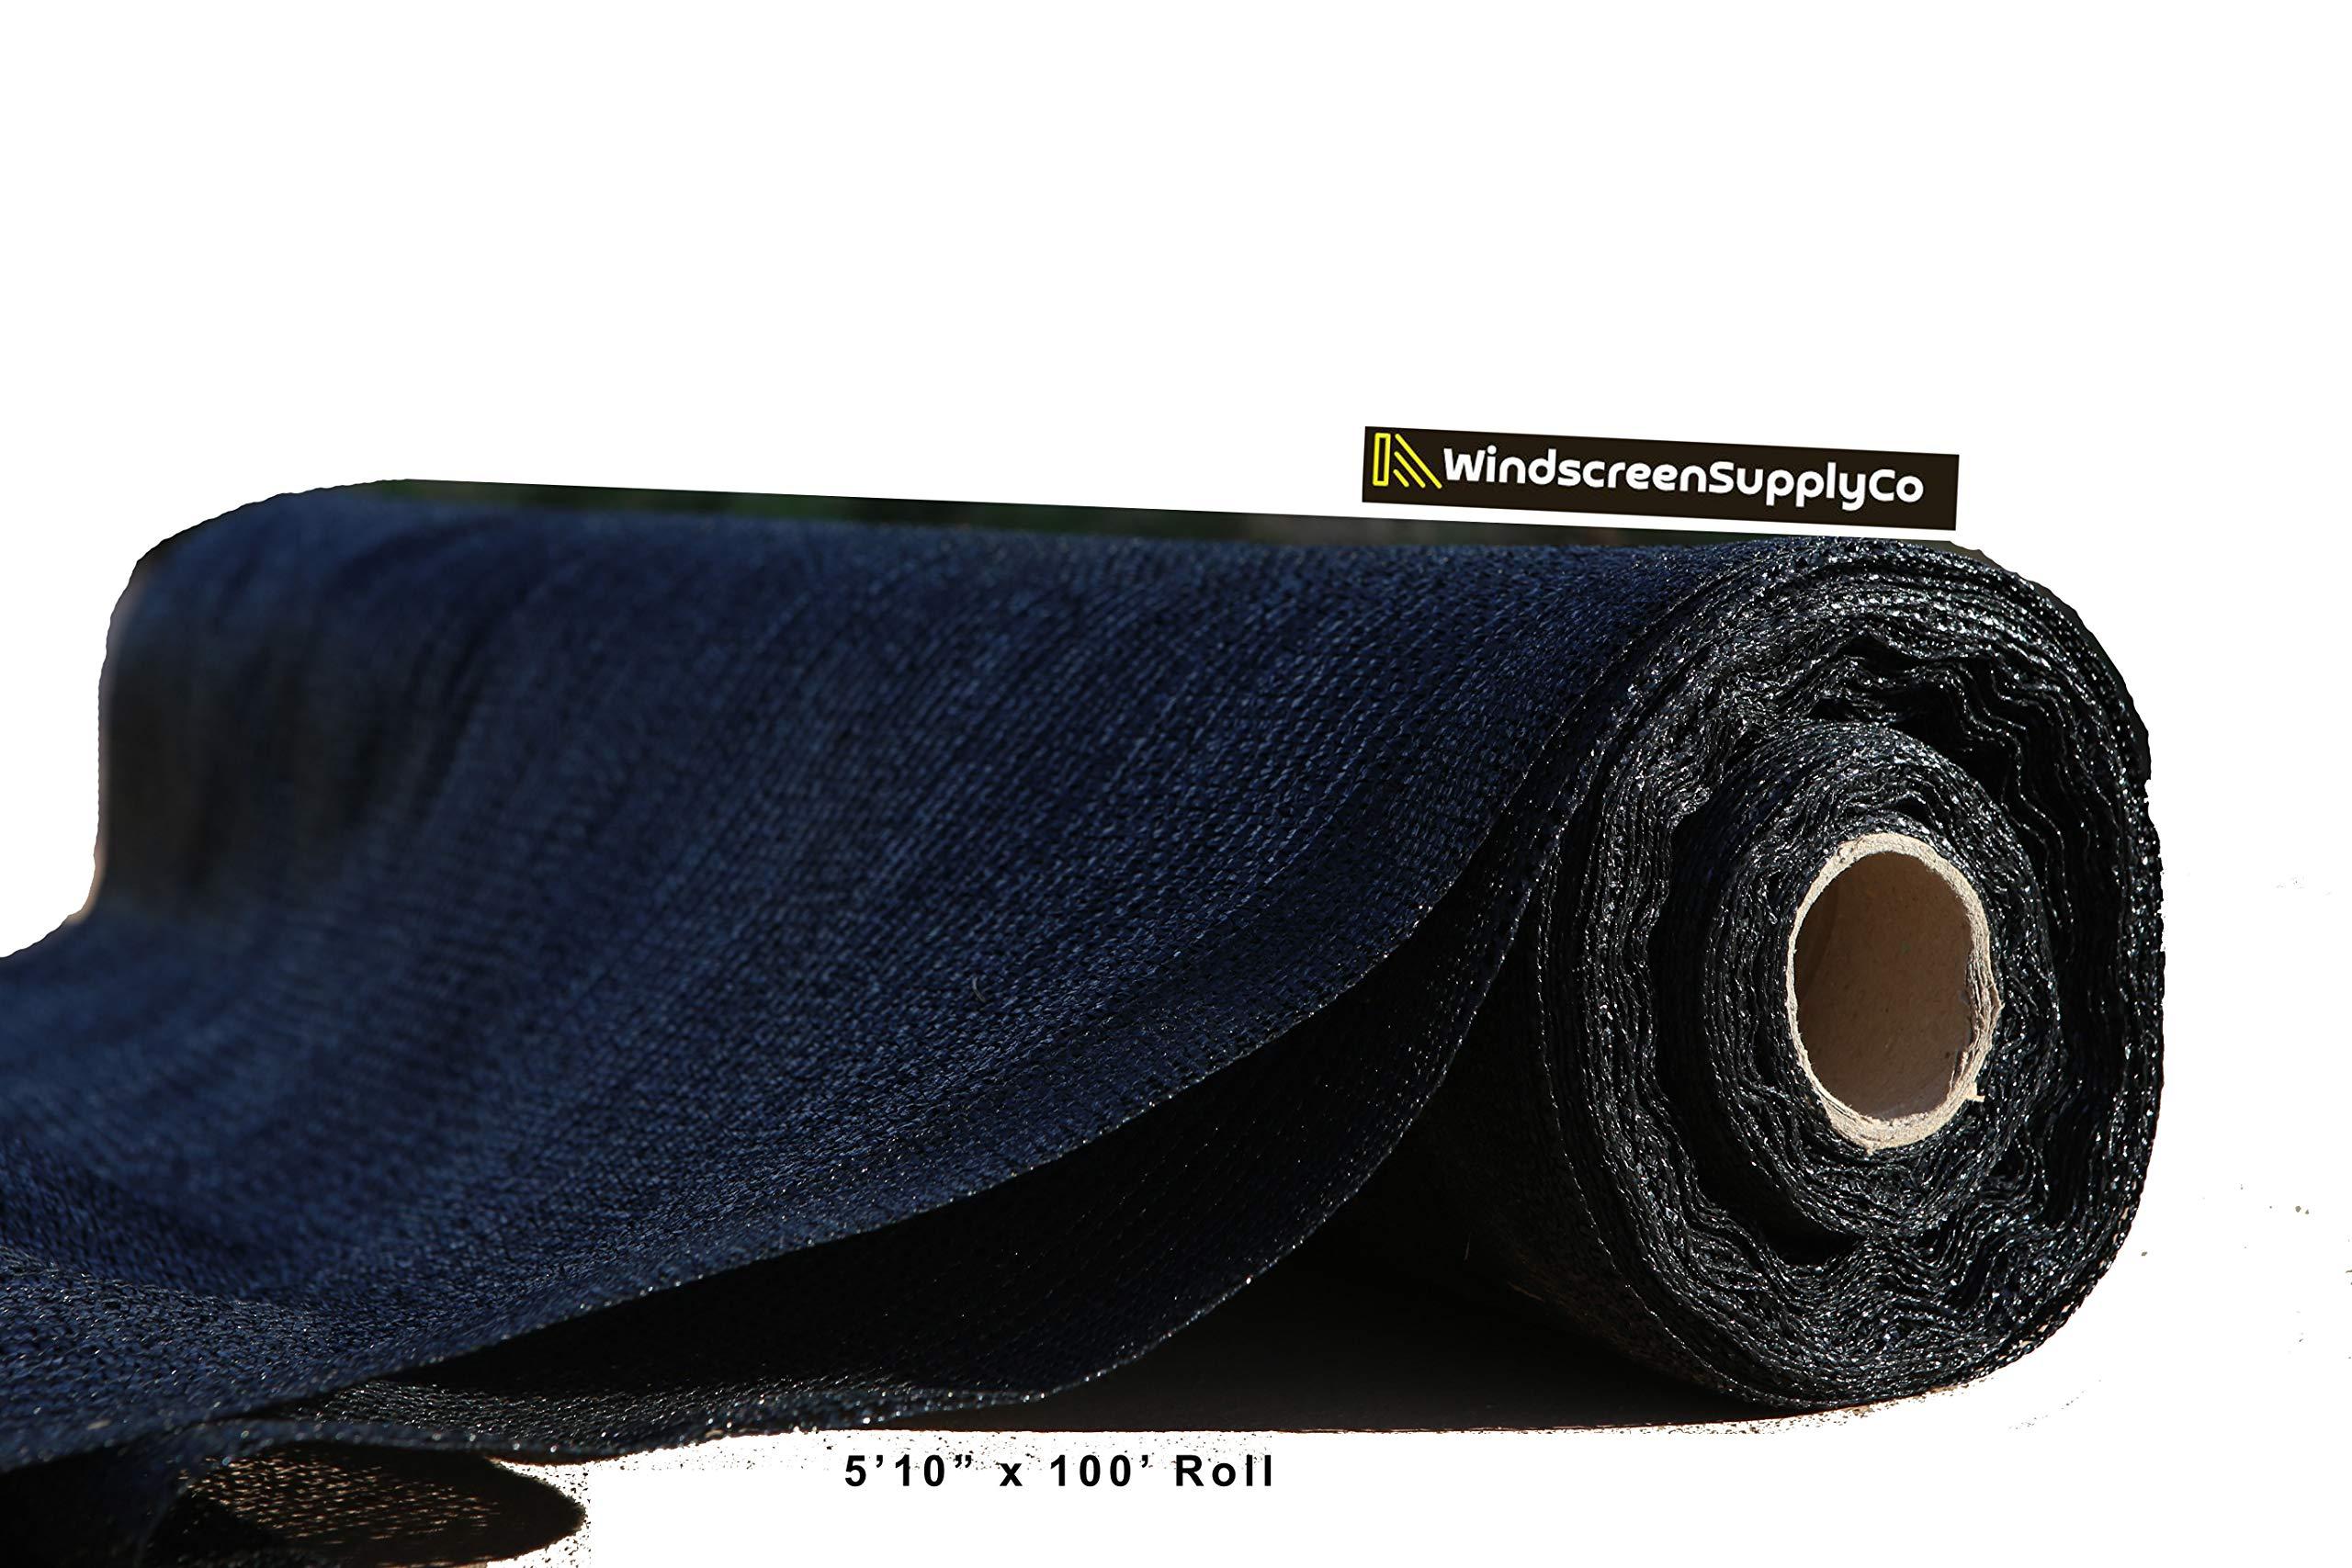 WindscreenSupplyCo 5'10'' x 100 ft. Bulk Shade Cloth 60% Black (1) by WindscreenSupplyCo